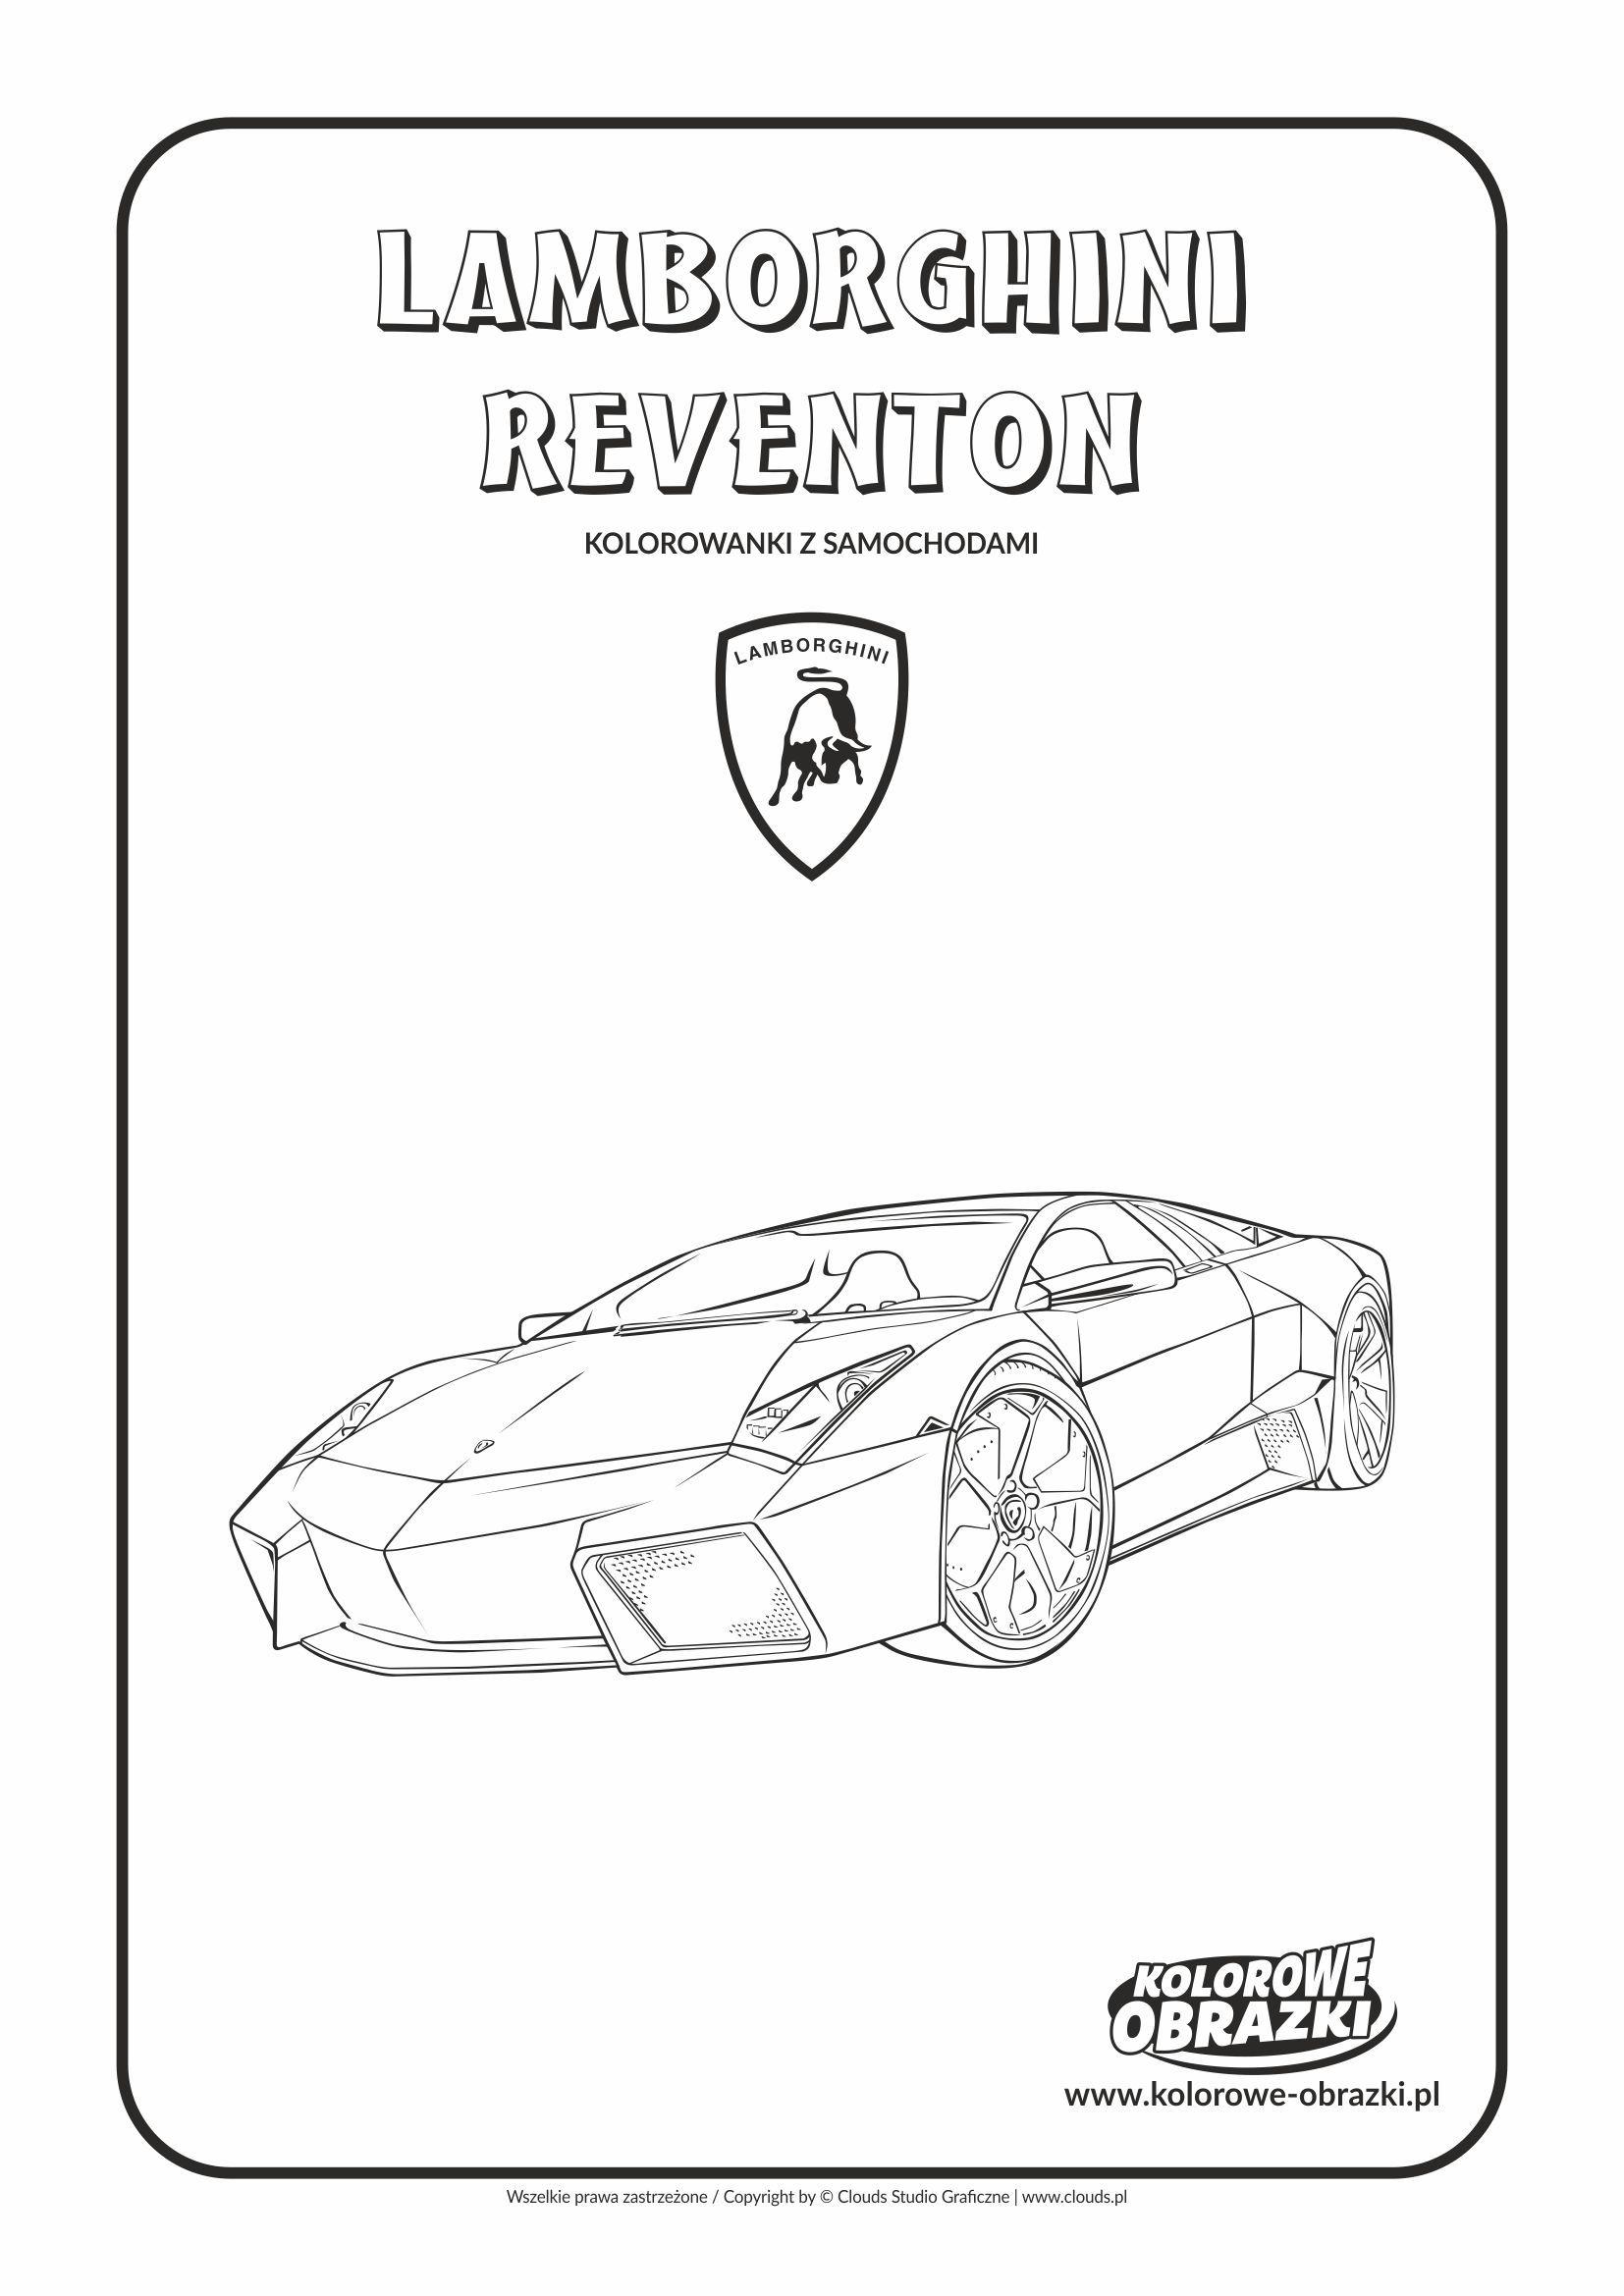 Lamborghini Reventon Lamborghini Kolorowanki Dla Dzieci